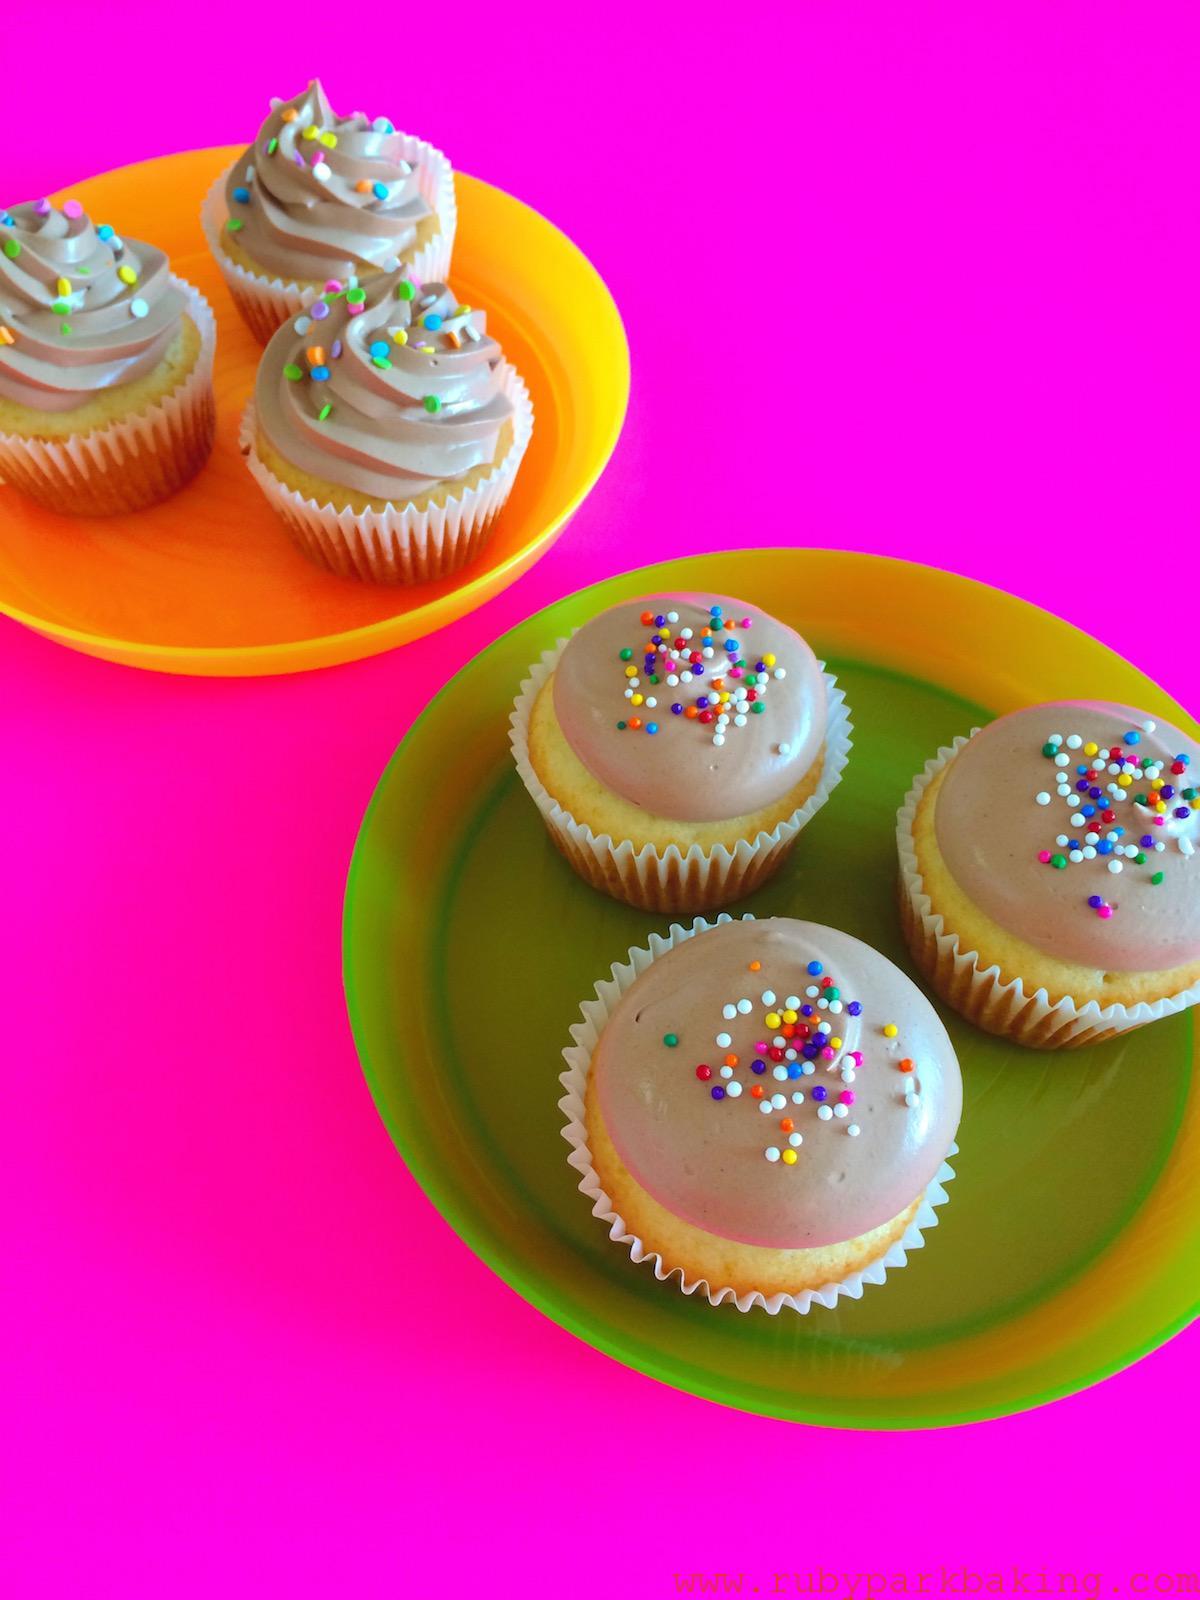 Vanilla chocolate chantilly cream cupcakes on rubyparkbaking.com